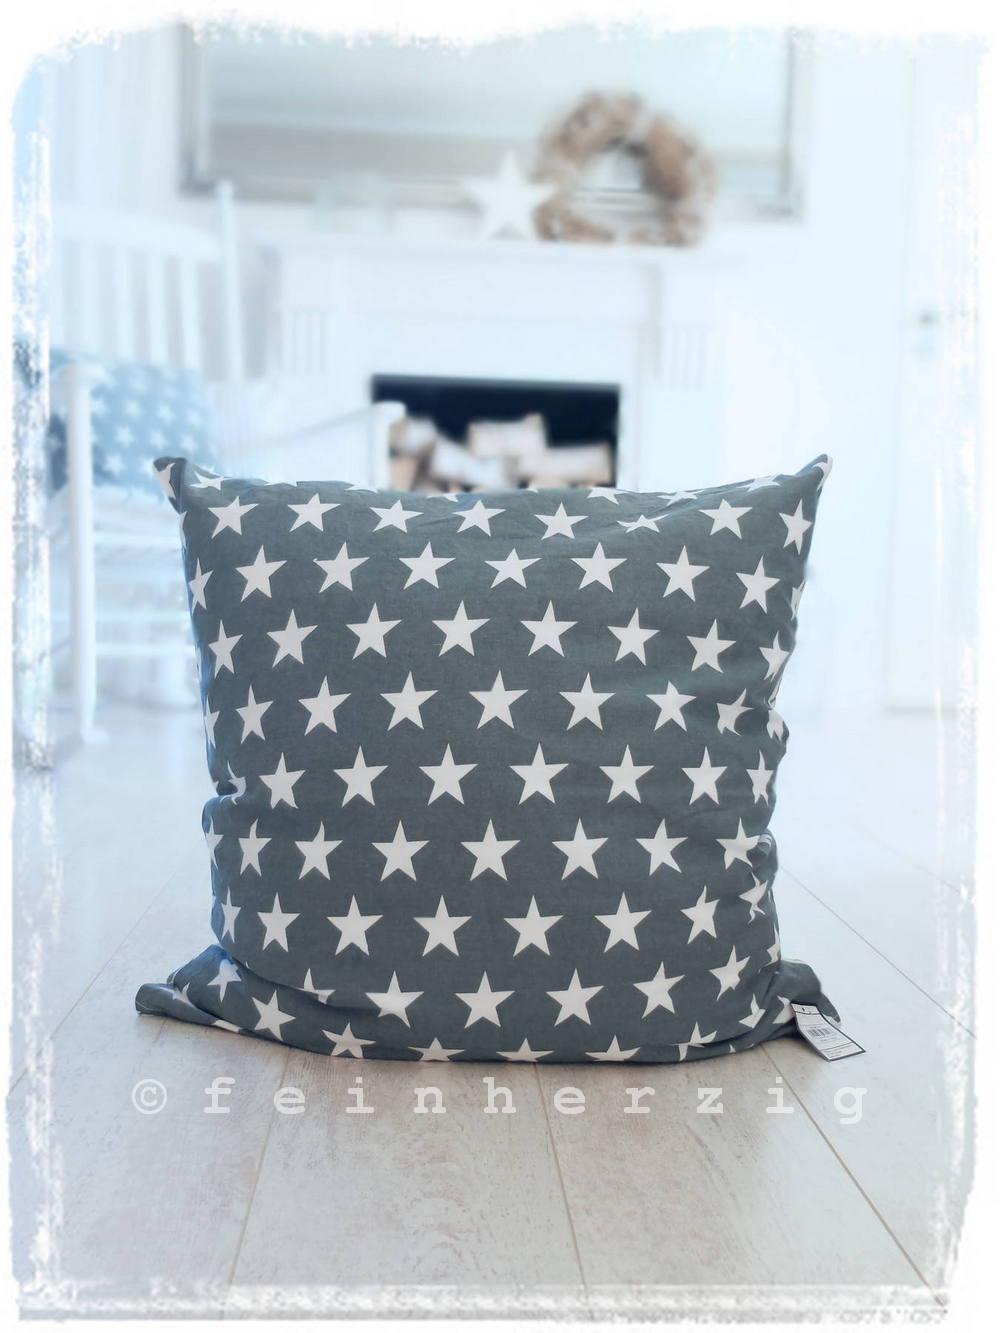 kissenh lle gro dunkelgrau wei e sterne kissenbezug shabby vintage 60x60 stern ebay. Black Bedroom Furniture Sets. Home Design Ideas